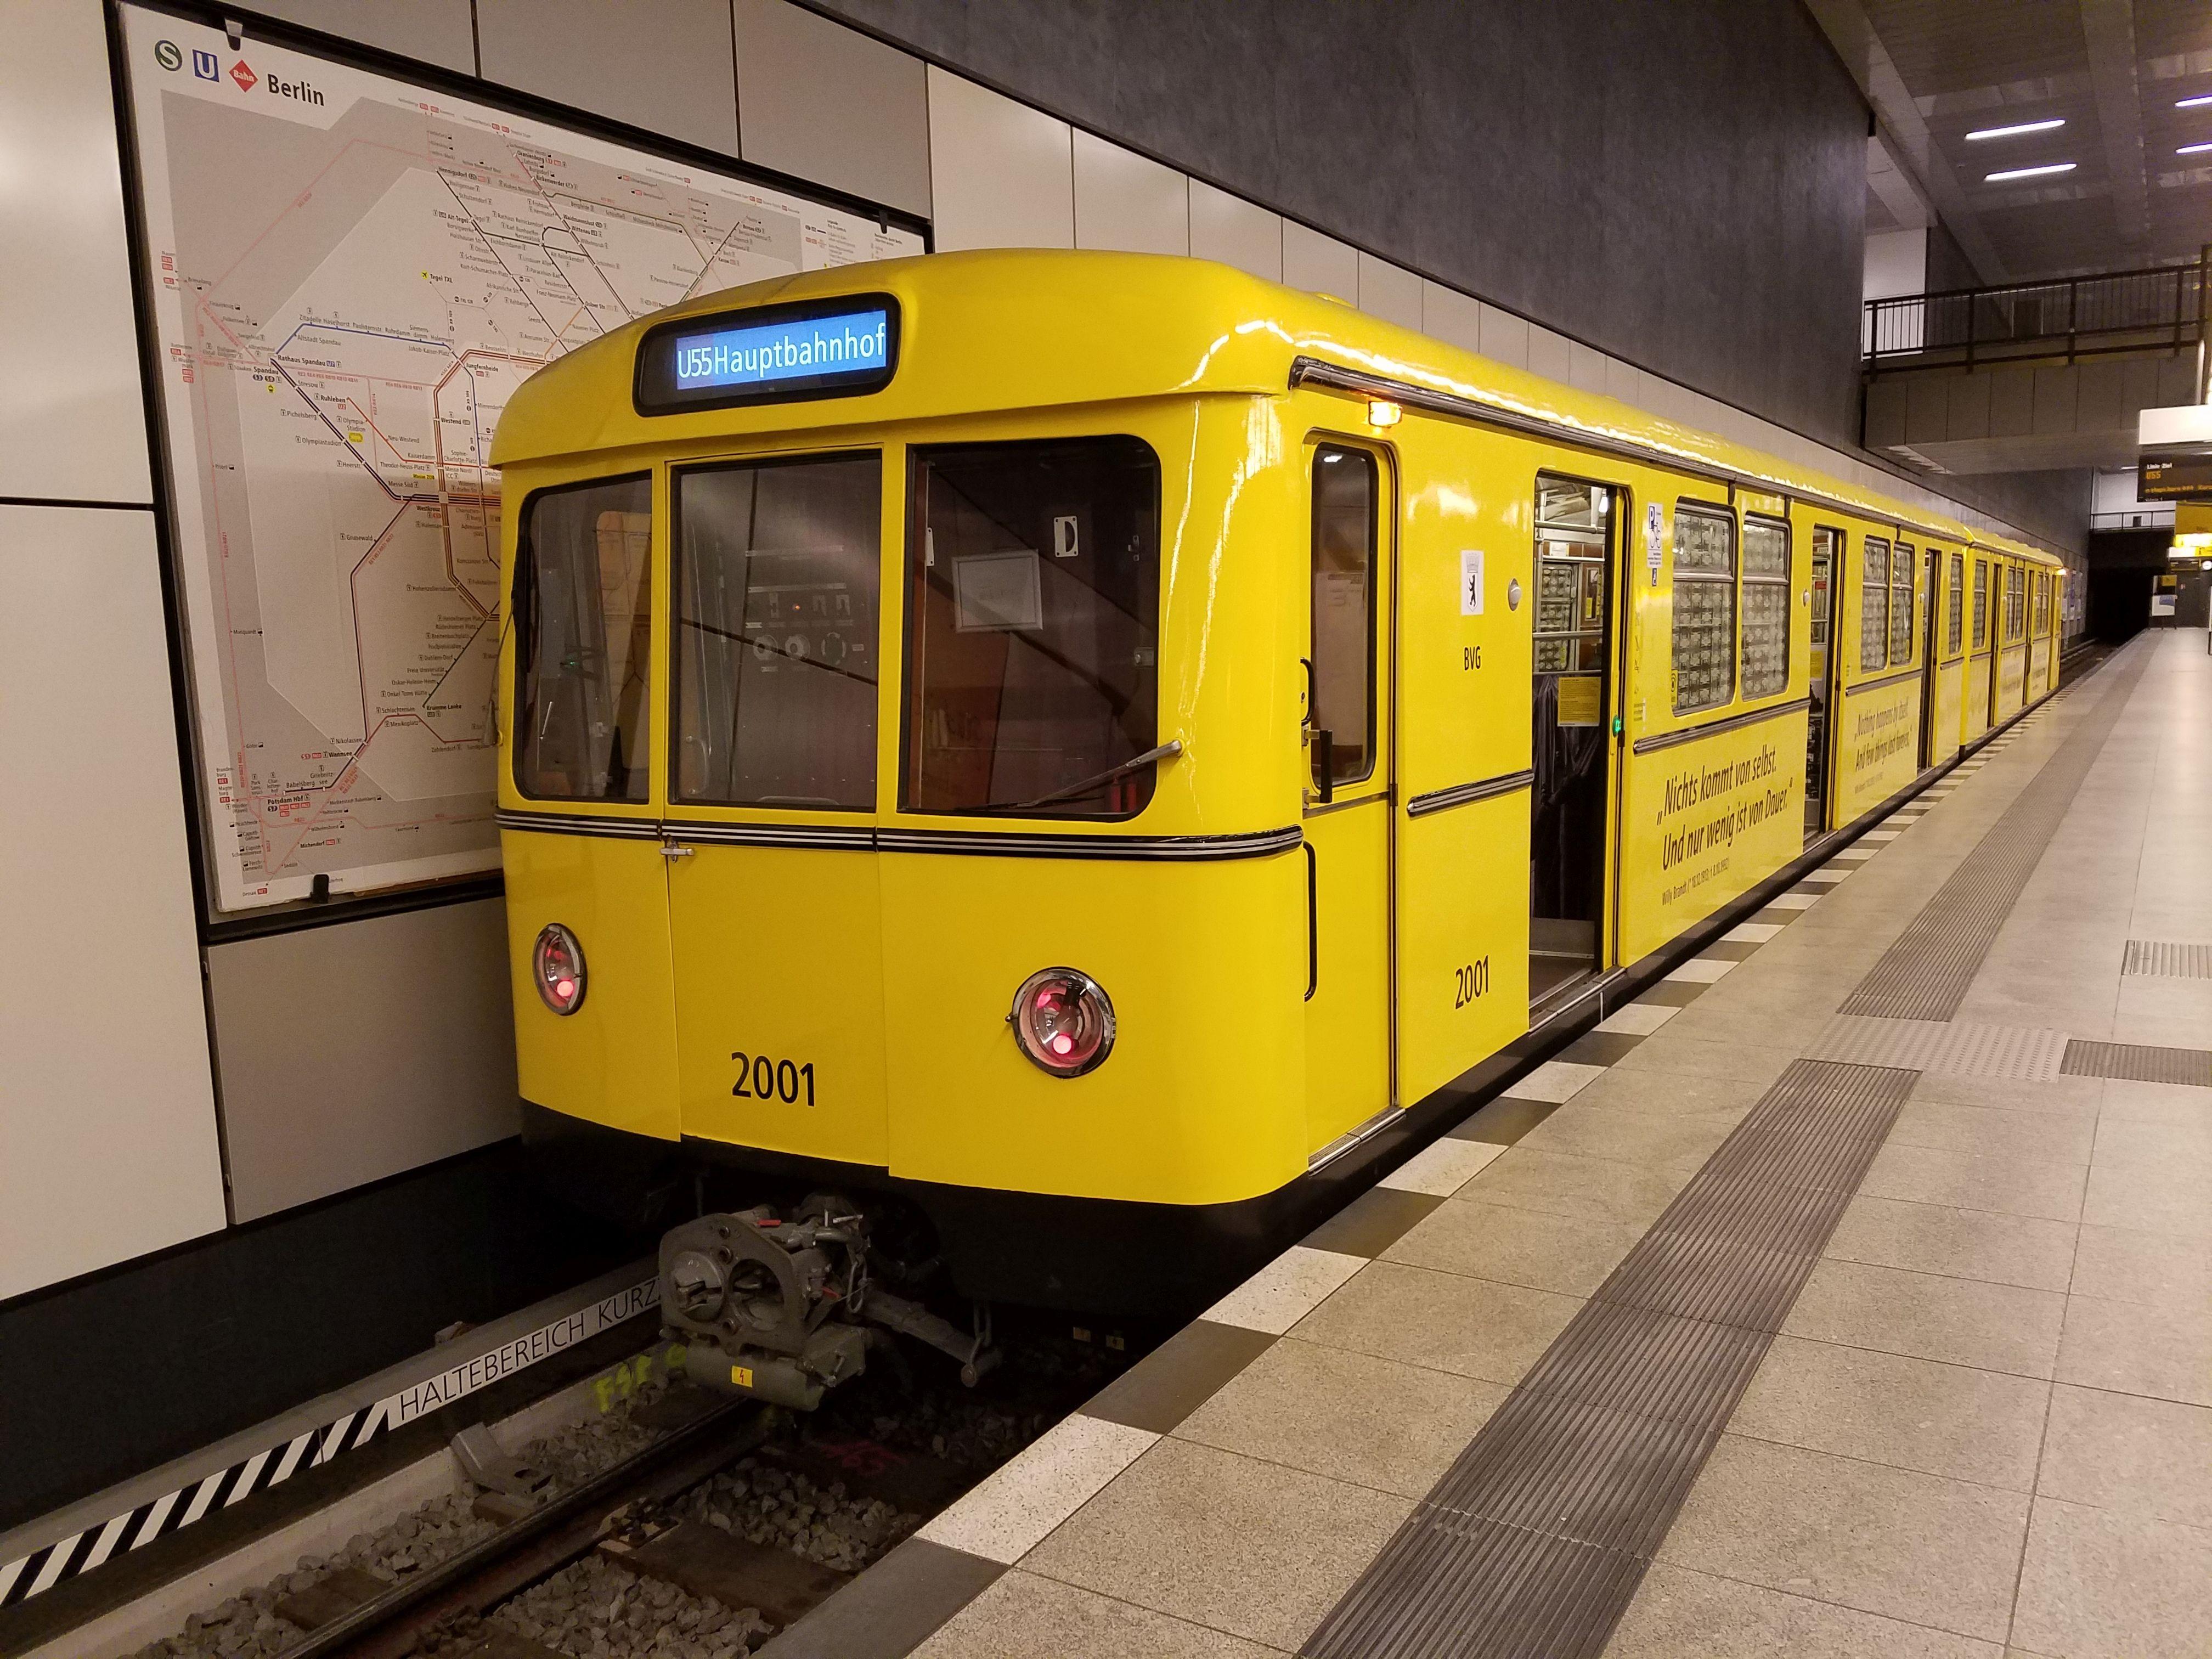 U-Bahn 2001, Baureihe D, Berlin Hbf, Januar 2018